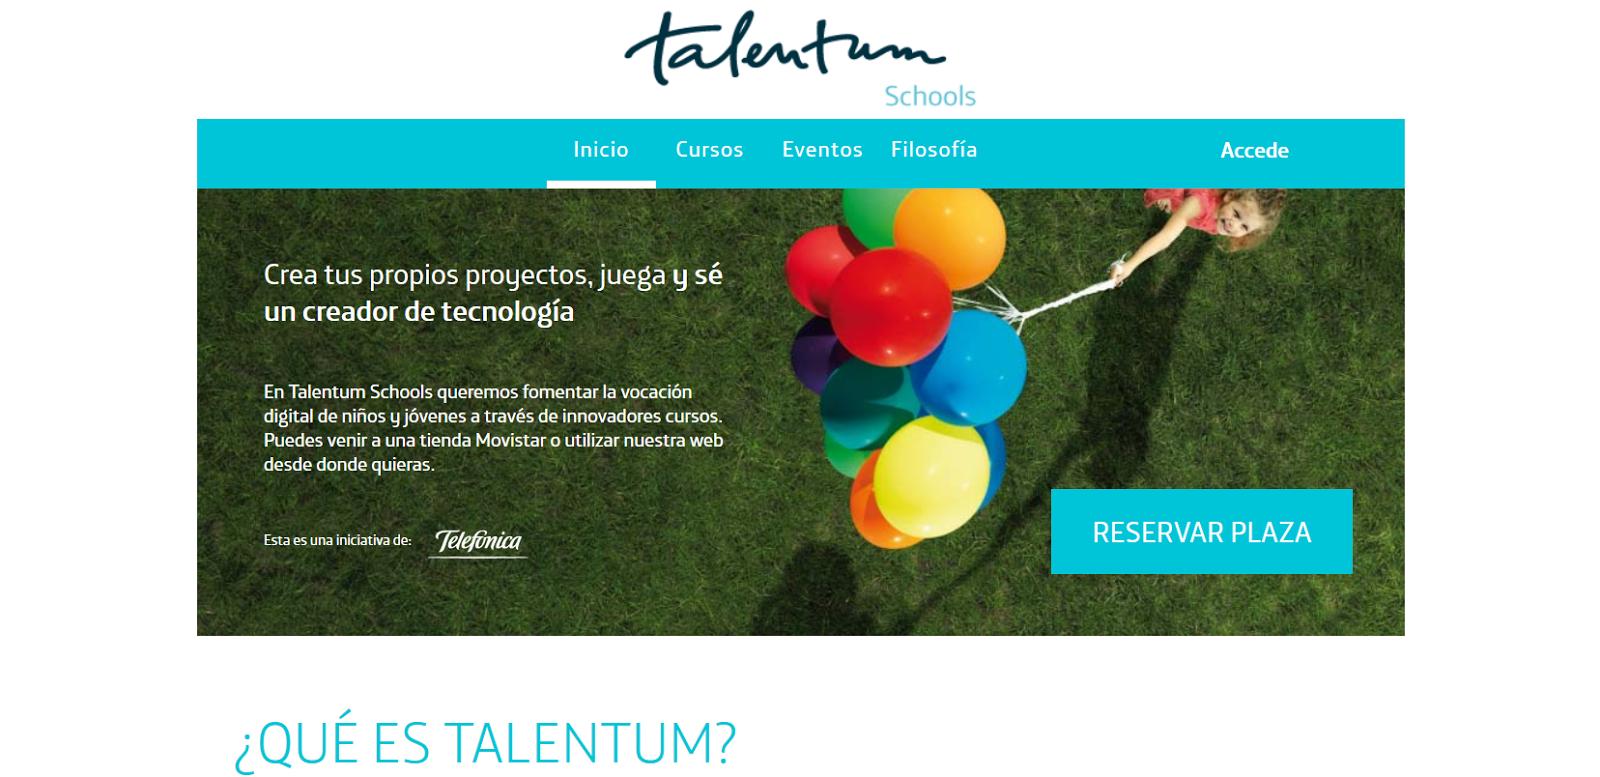 http://talentumschools.com/Inicio